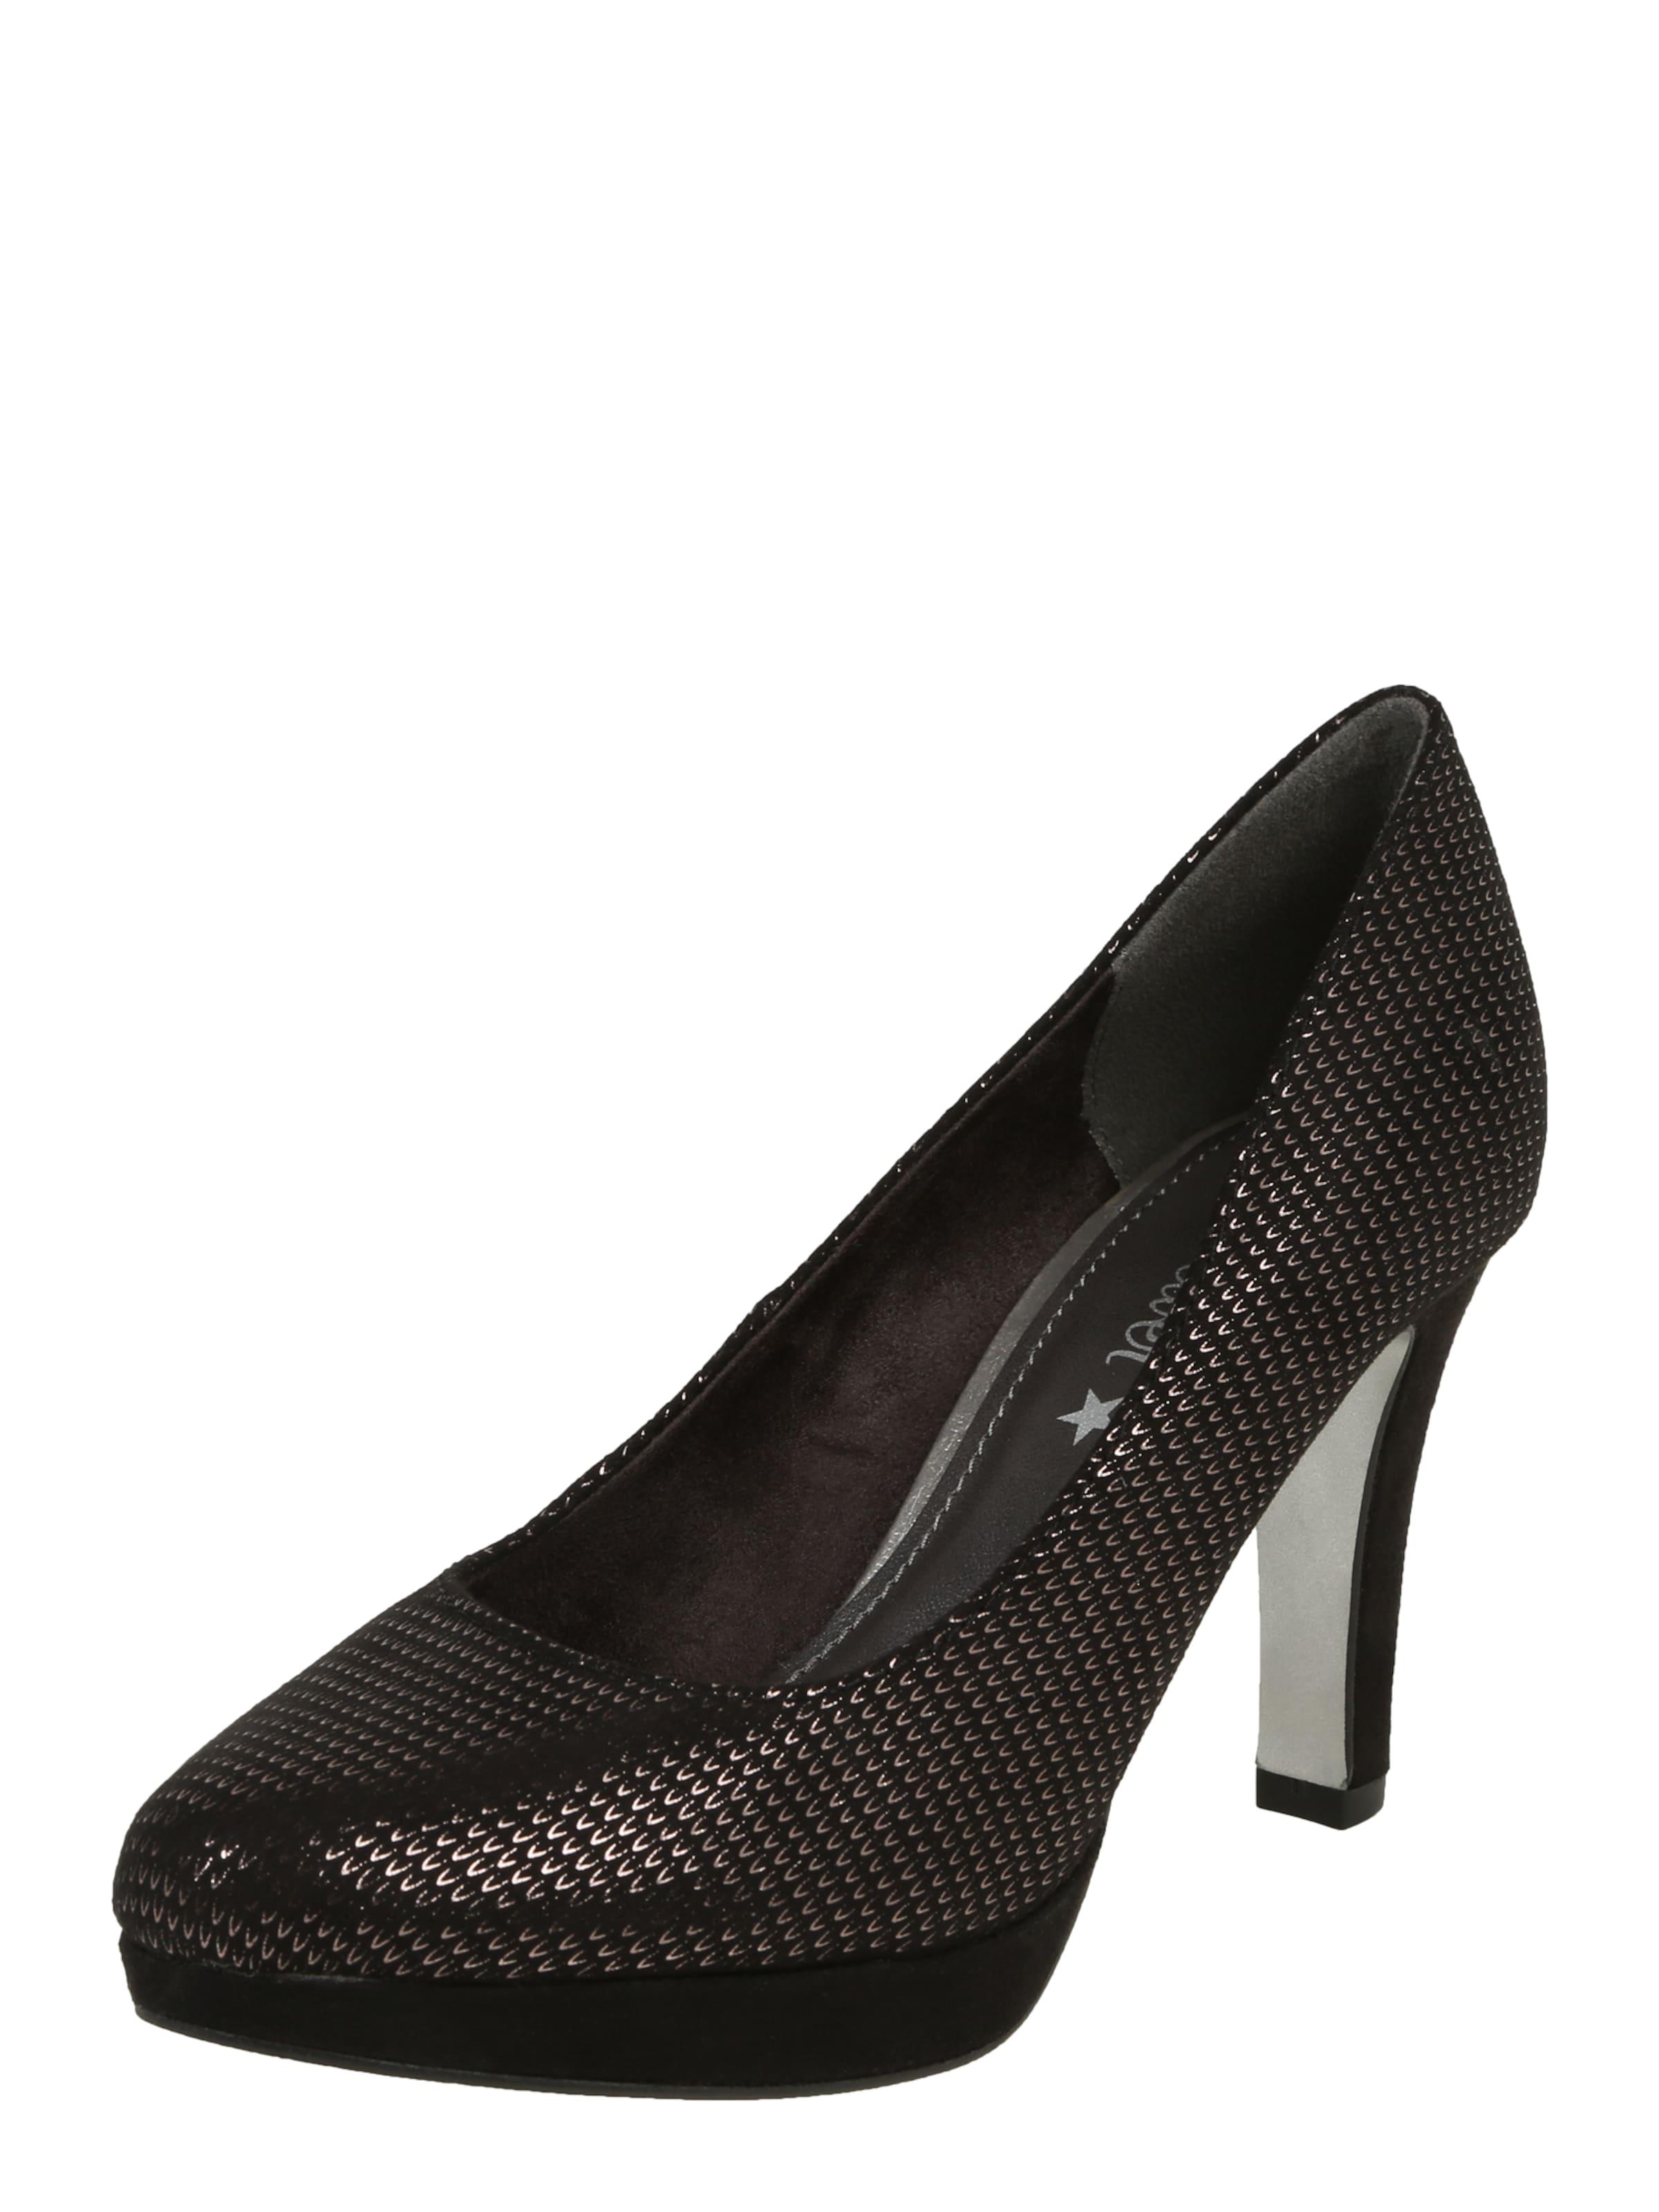 s.Oliver RED LABEL Plateaupumps Verschleißfeste billige Schuhe